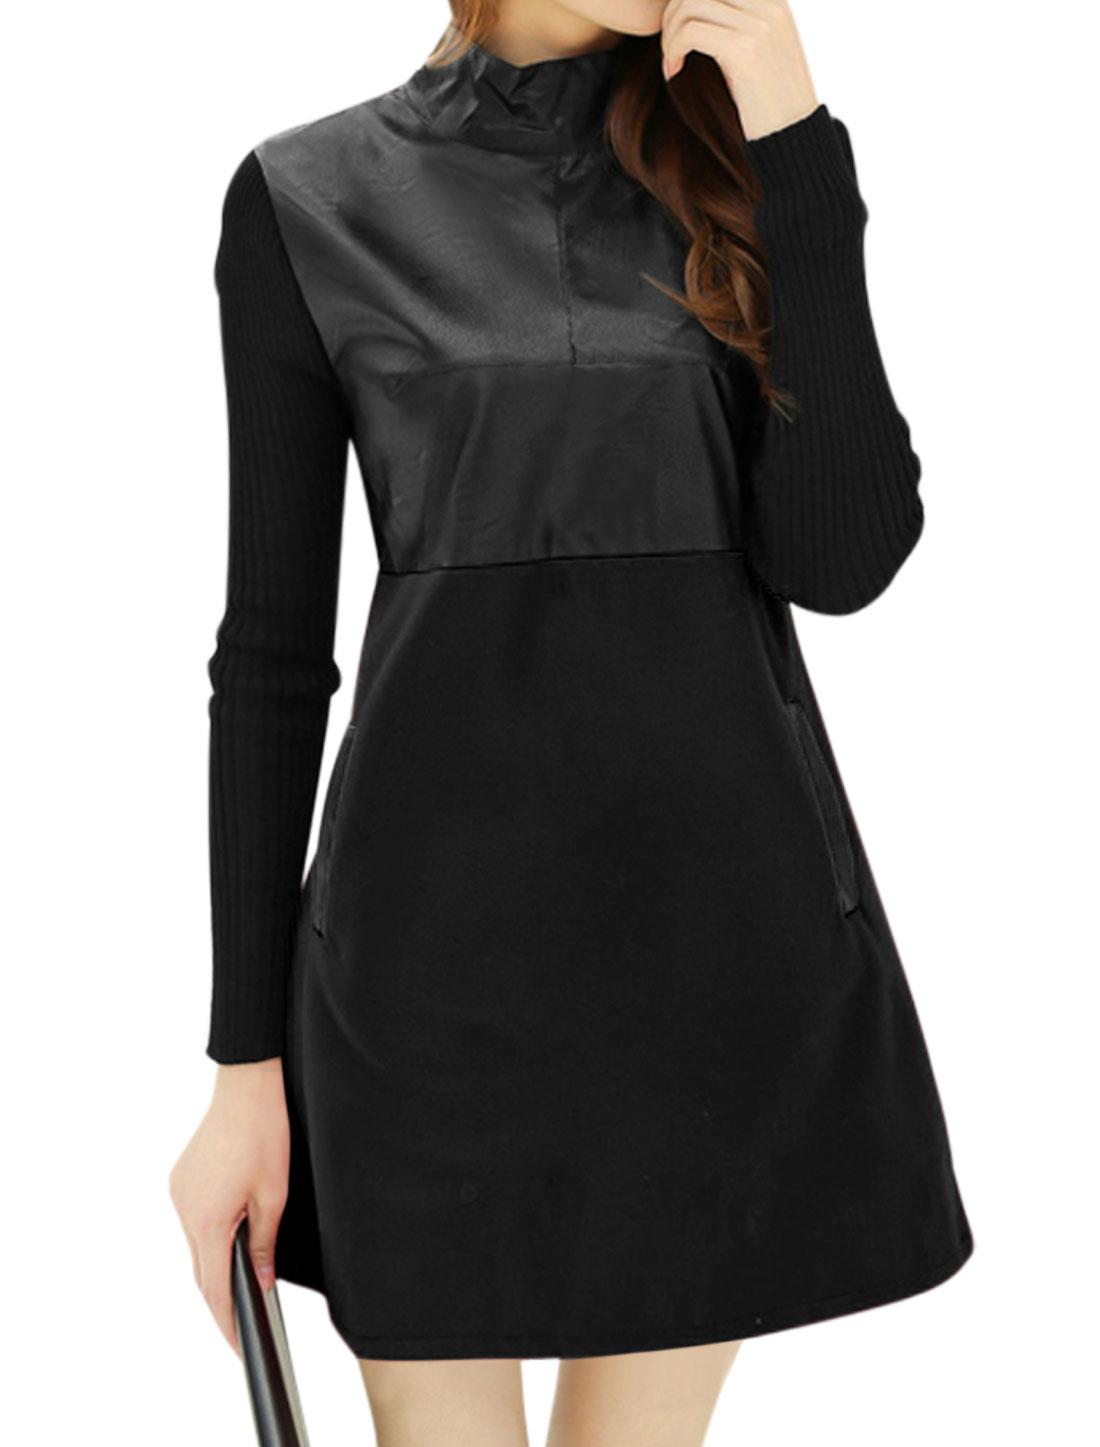 Women Knitting Long Sleeves PU Panel A Line Tunic Worsted Dress Black M